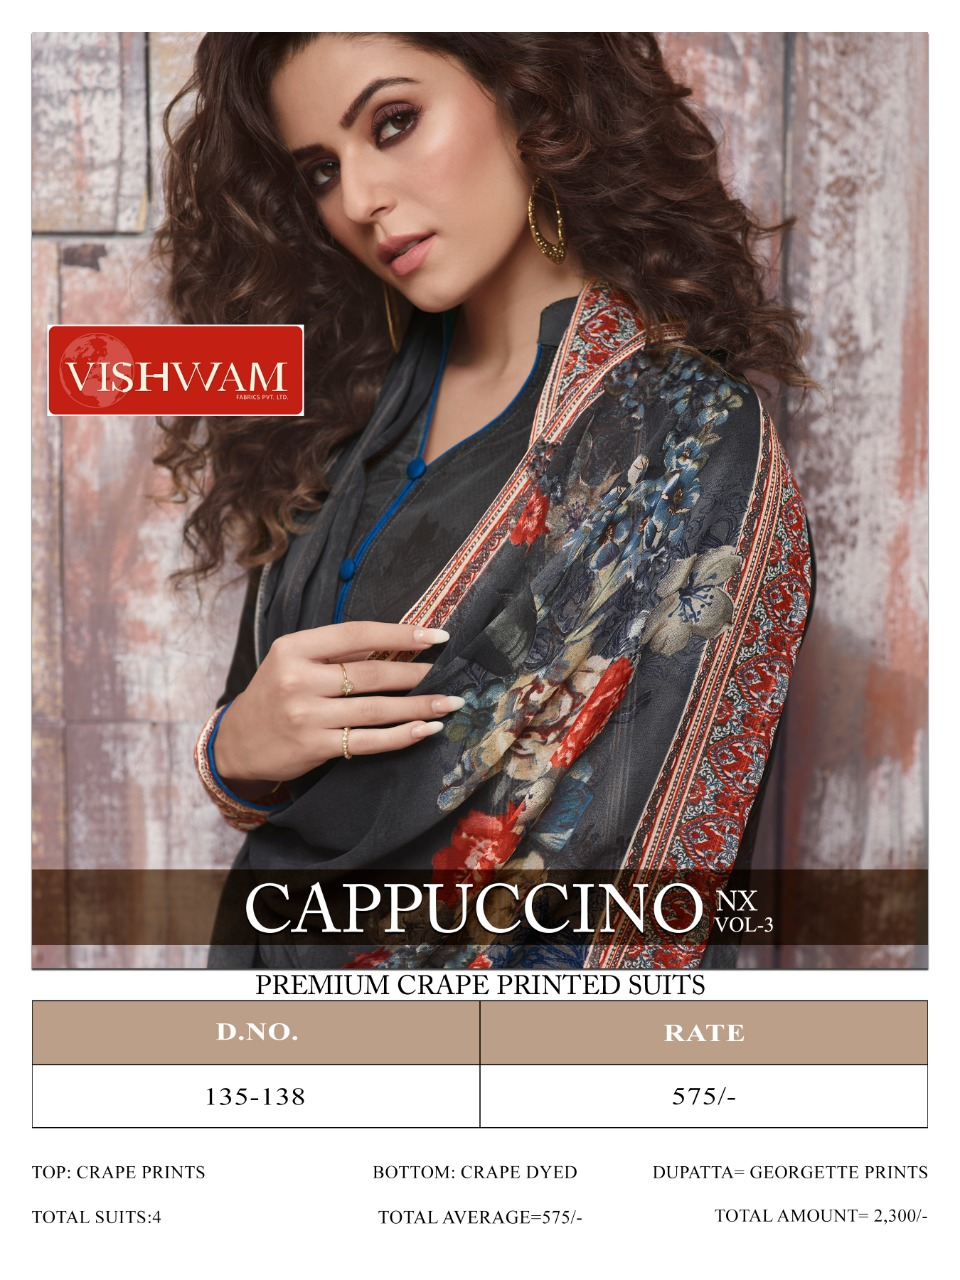 Vishwam Cappuccino Vol 3 Nx Designer Crepe Printed Suits Wholesale